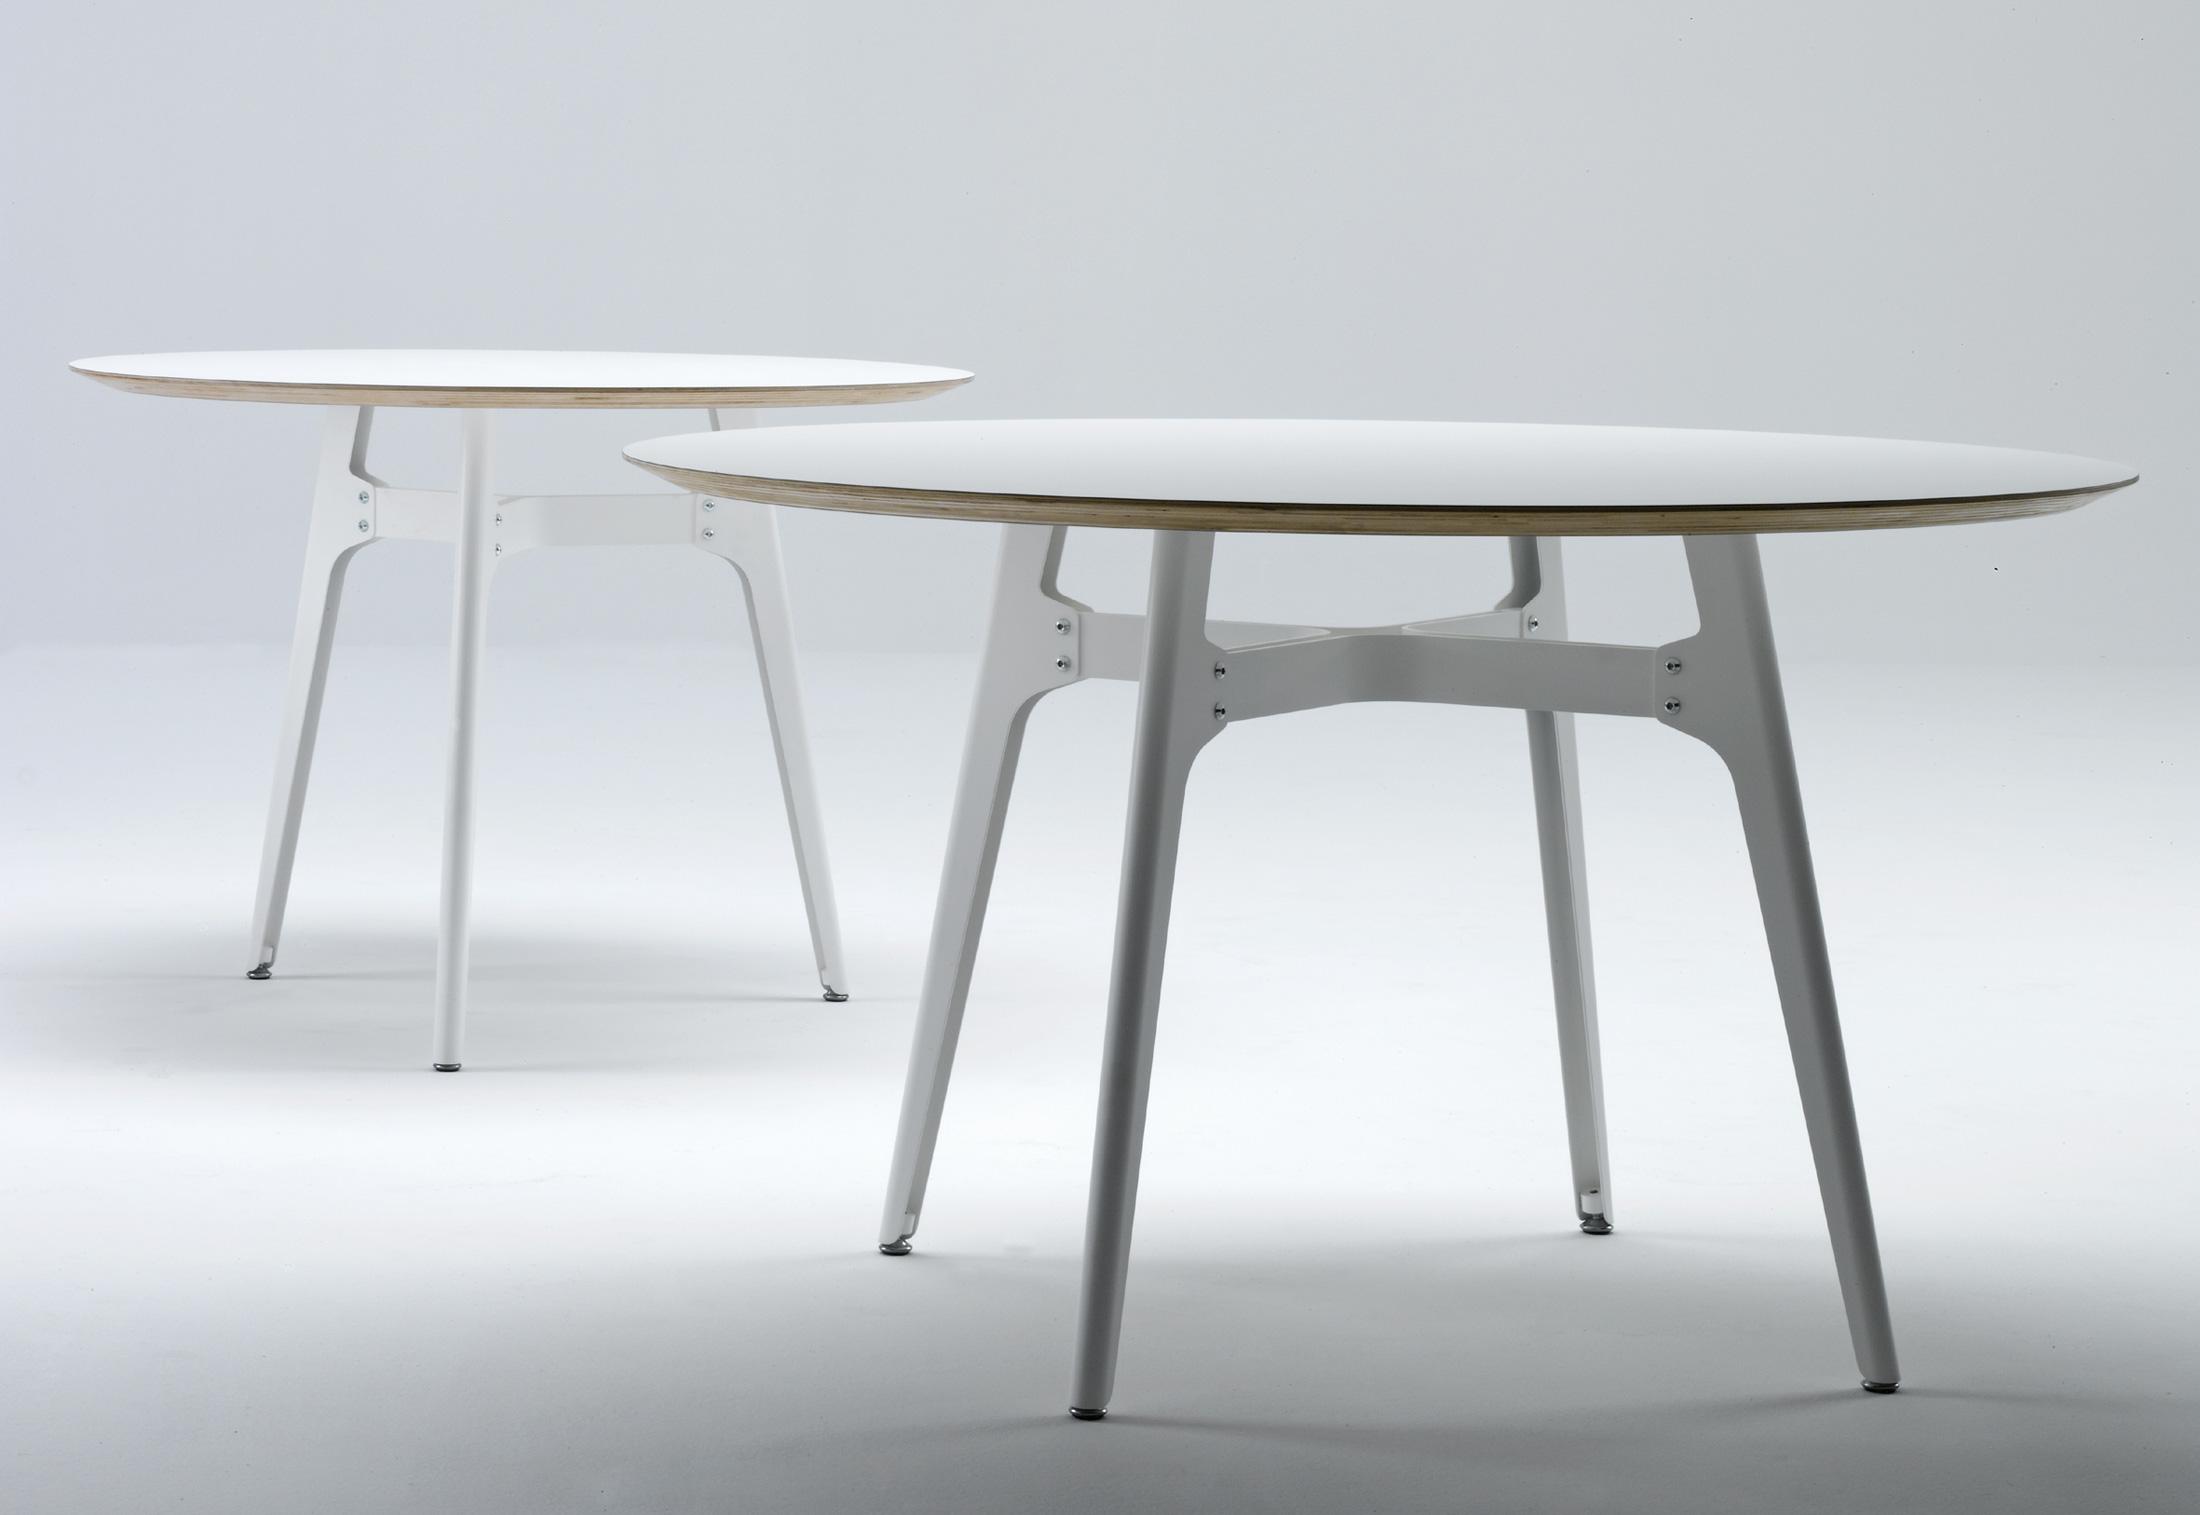 Otis di de padova tavoli arredamento mollura home design for Tavolo rotondo kristalia